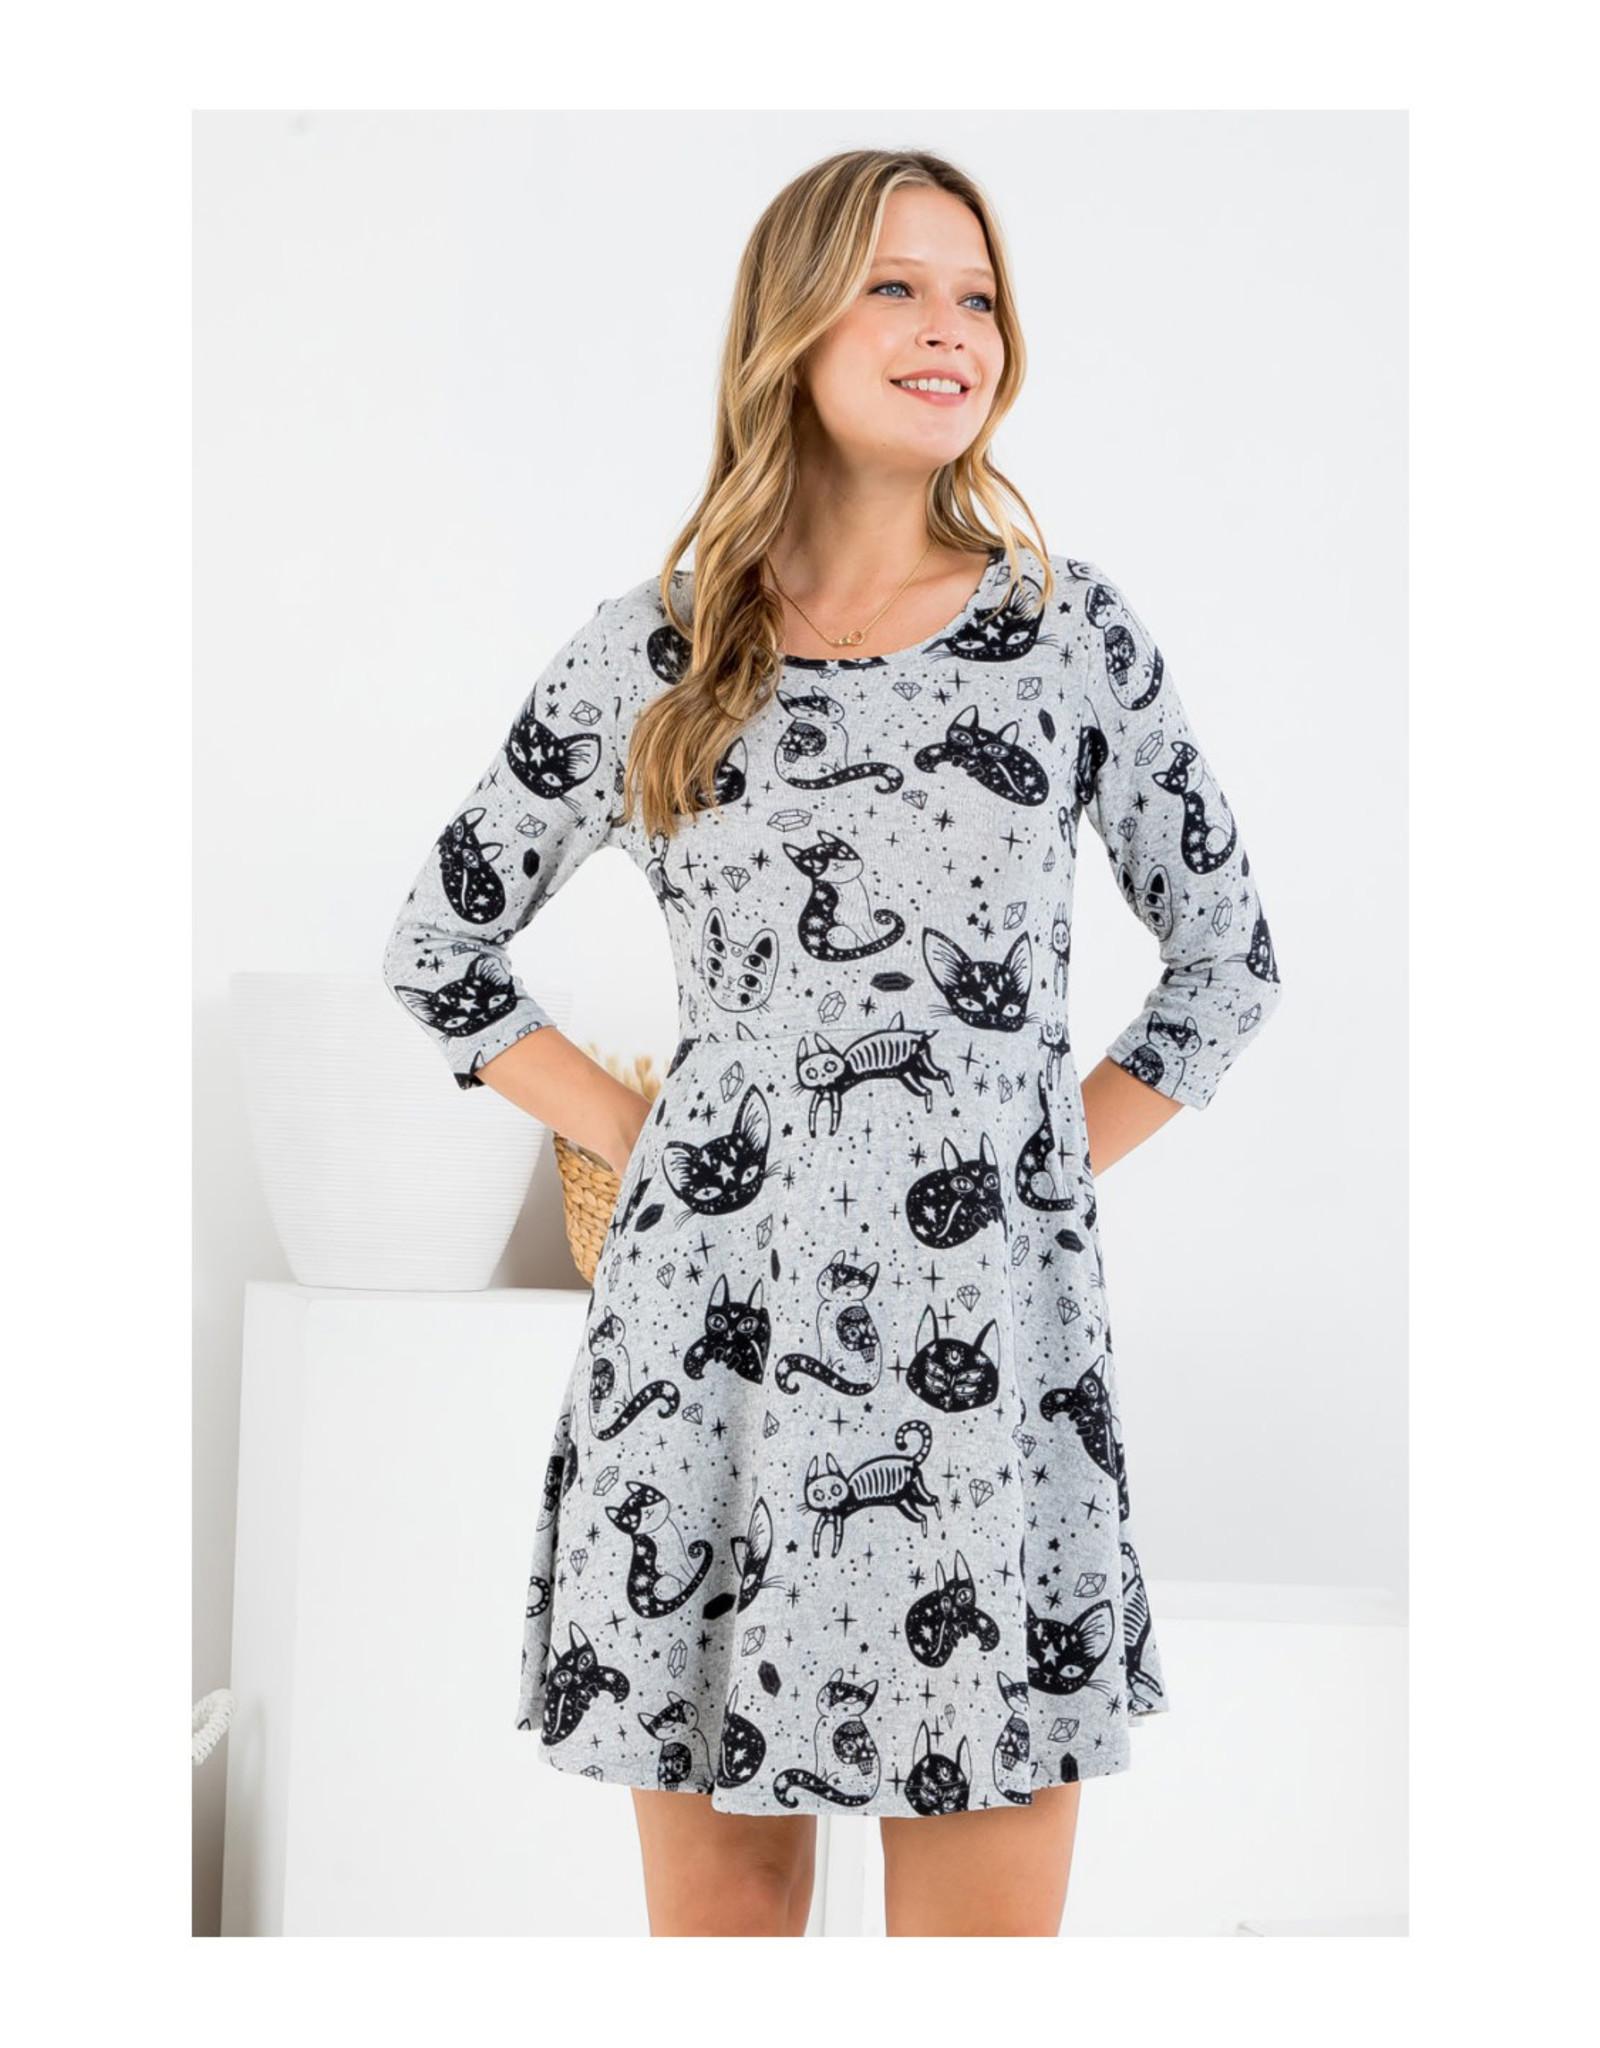 Crystal Kitty Tunic Dress